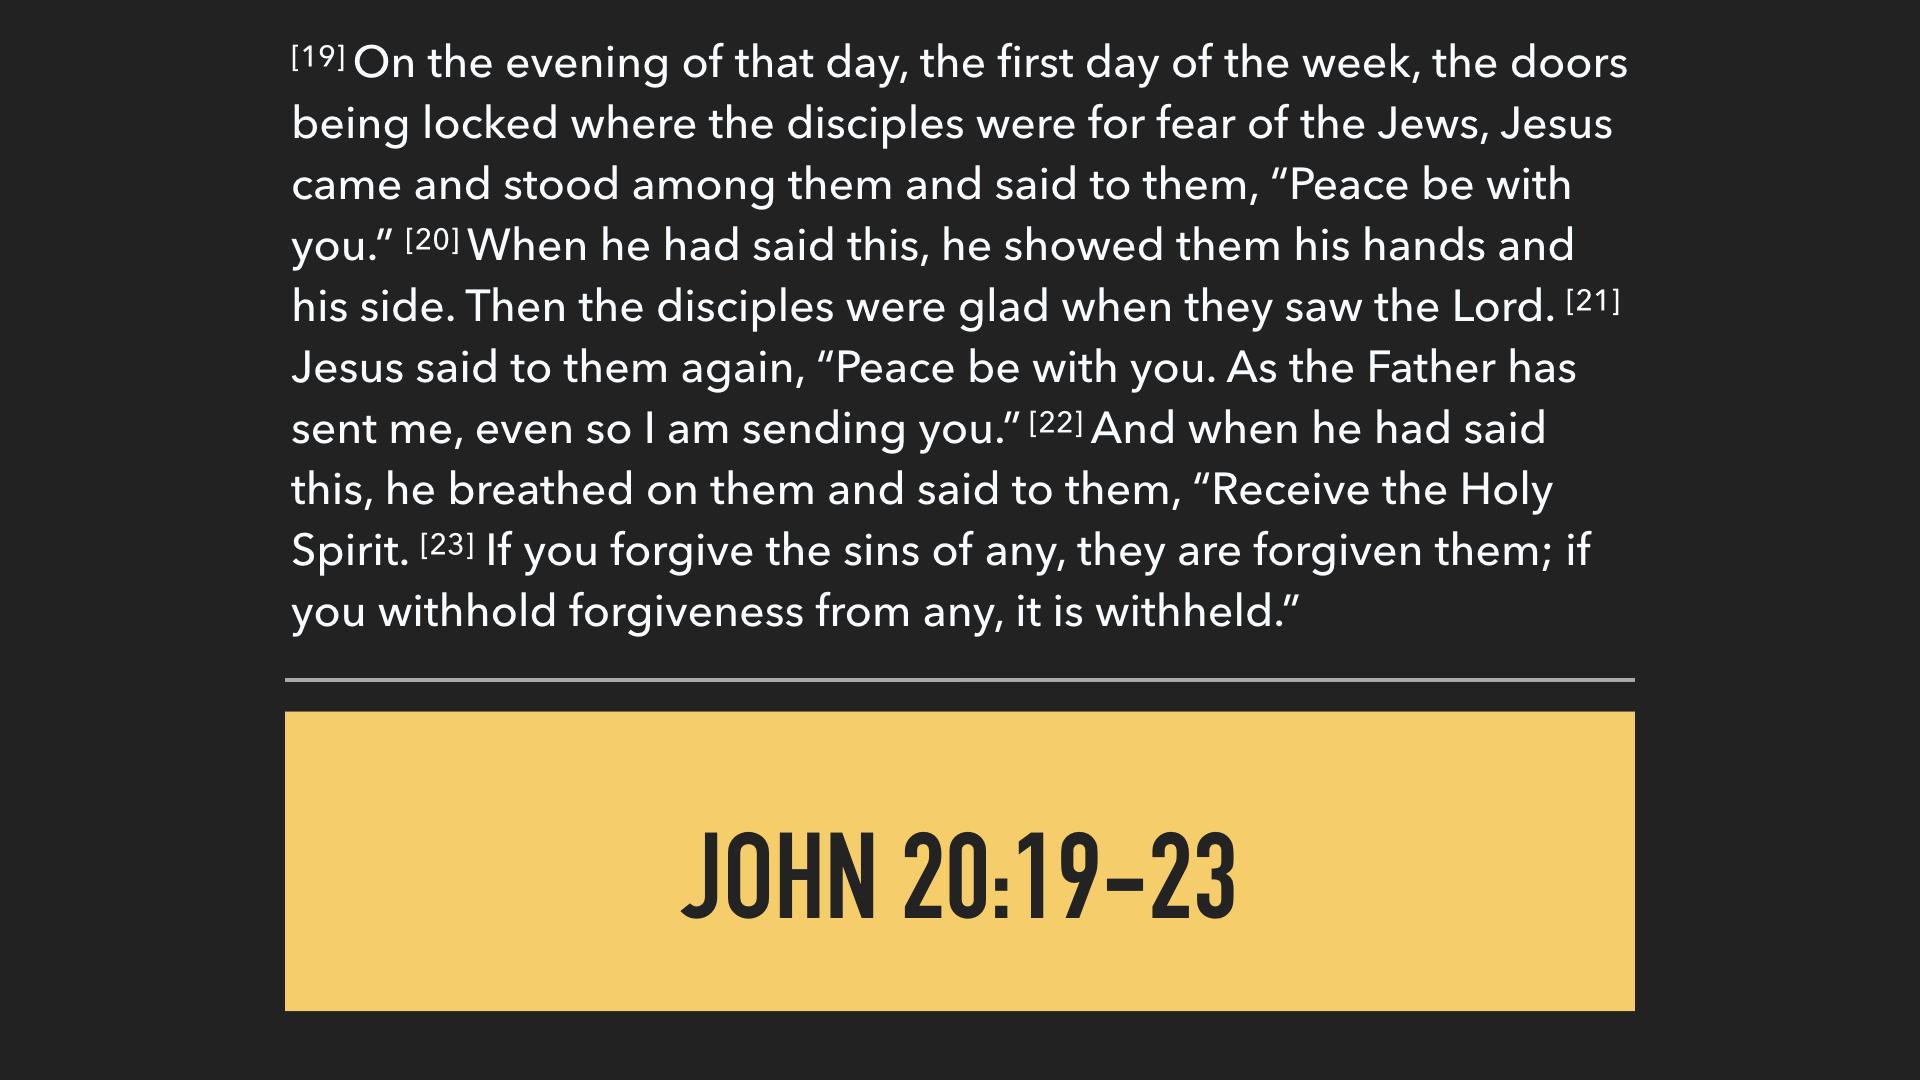 John 20:19-23.002.jpeg